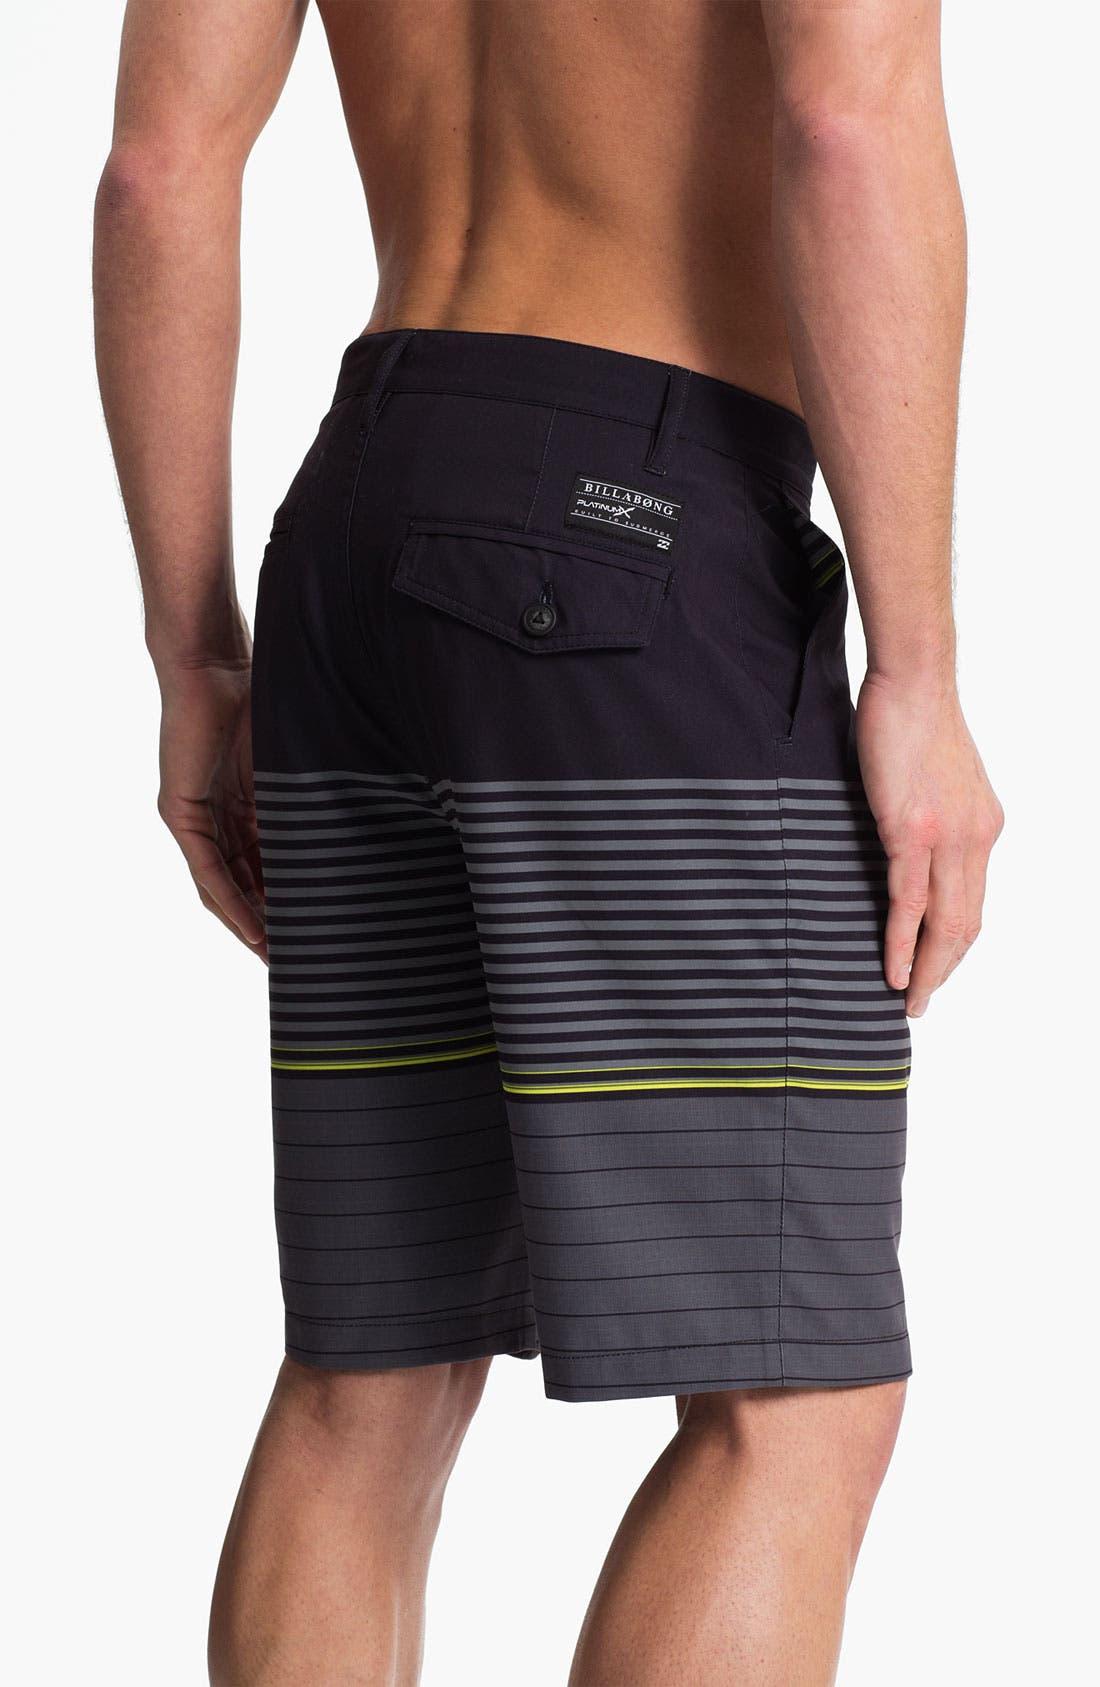 Alternate Image 2  - Billabong 'Stacked' Hybrid Shorts (Online Exclusive)